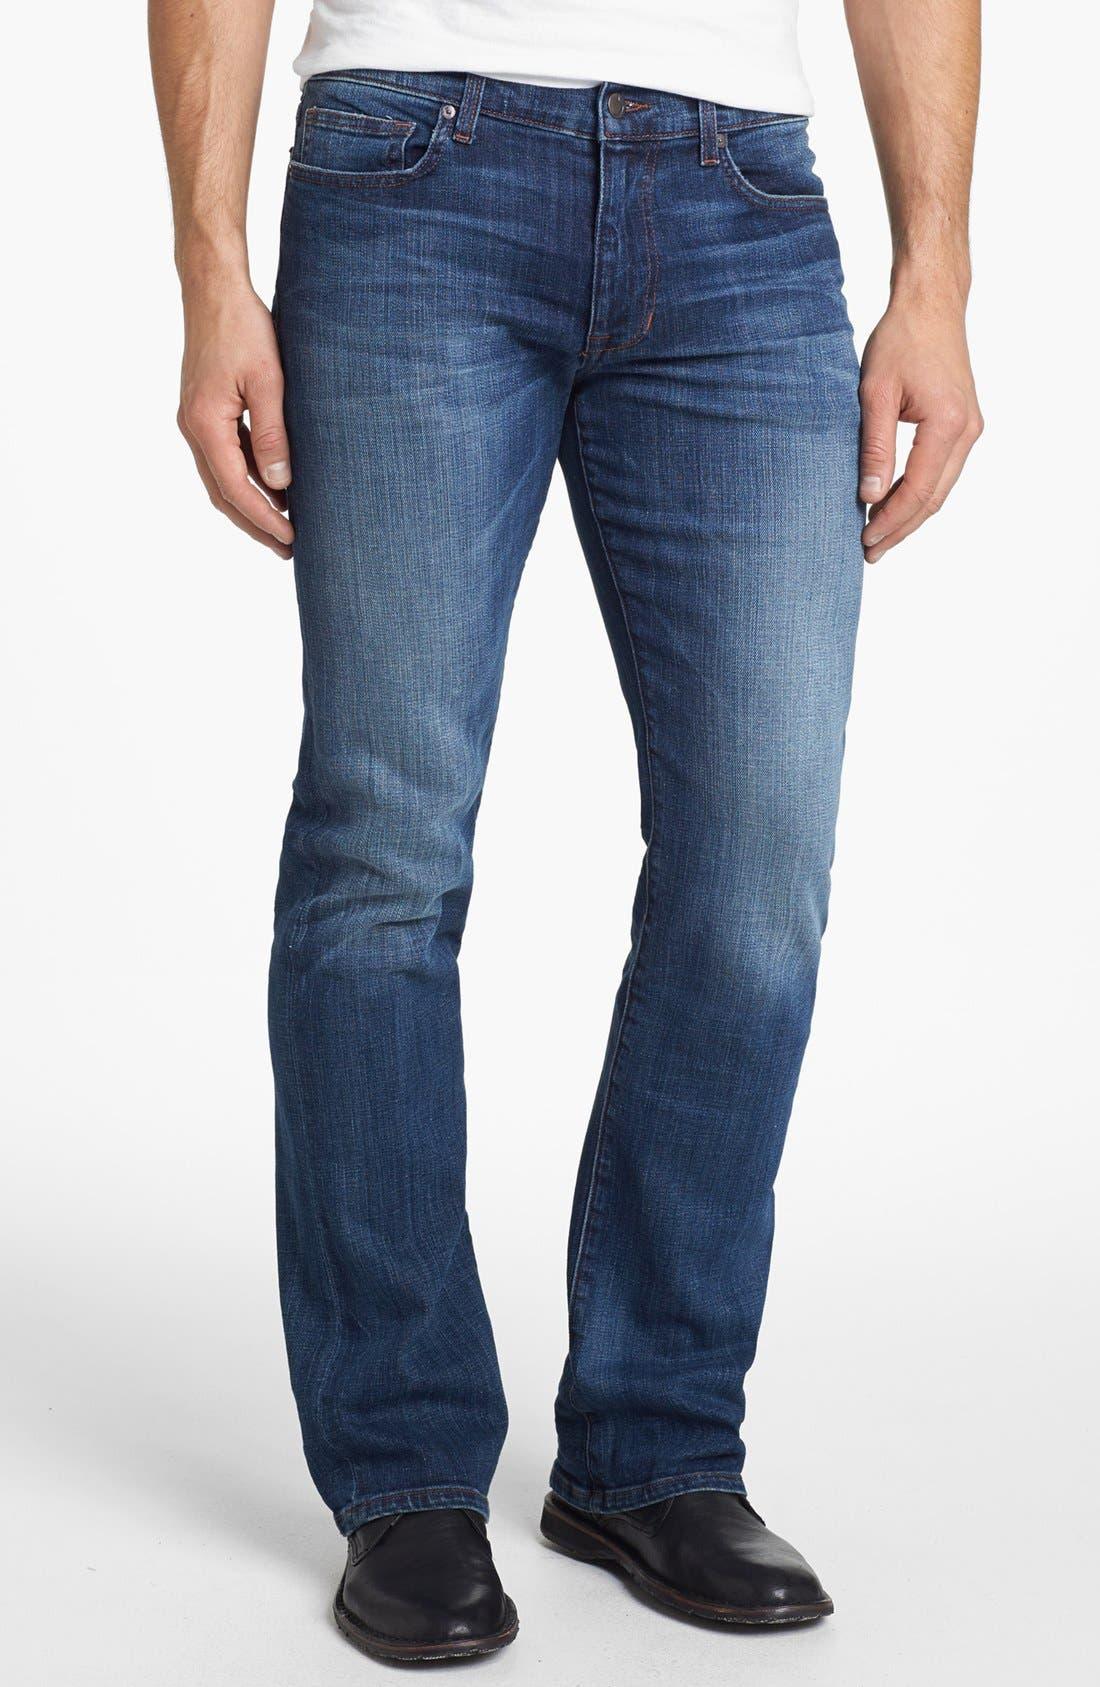 Alternate Image 1 Selected - Joe's 'Rocker' Bootcut Jeans (Abel)